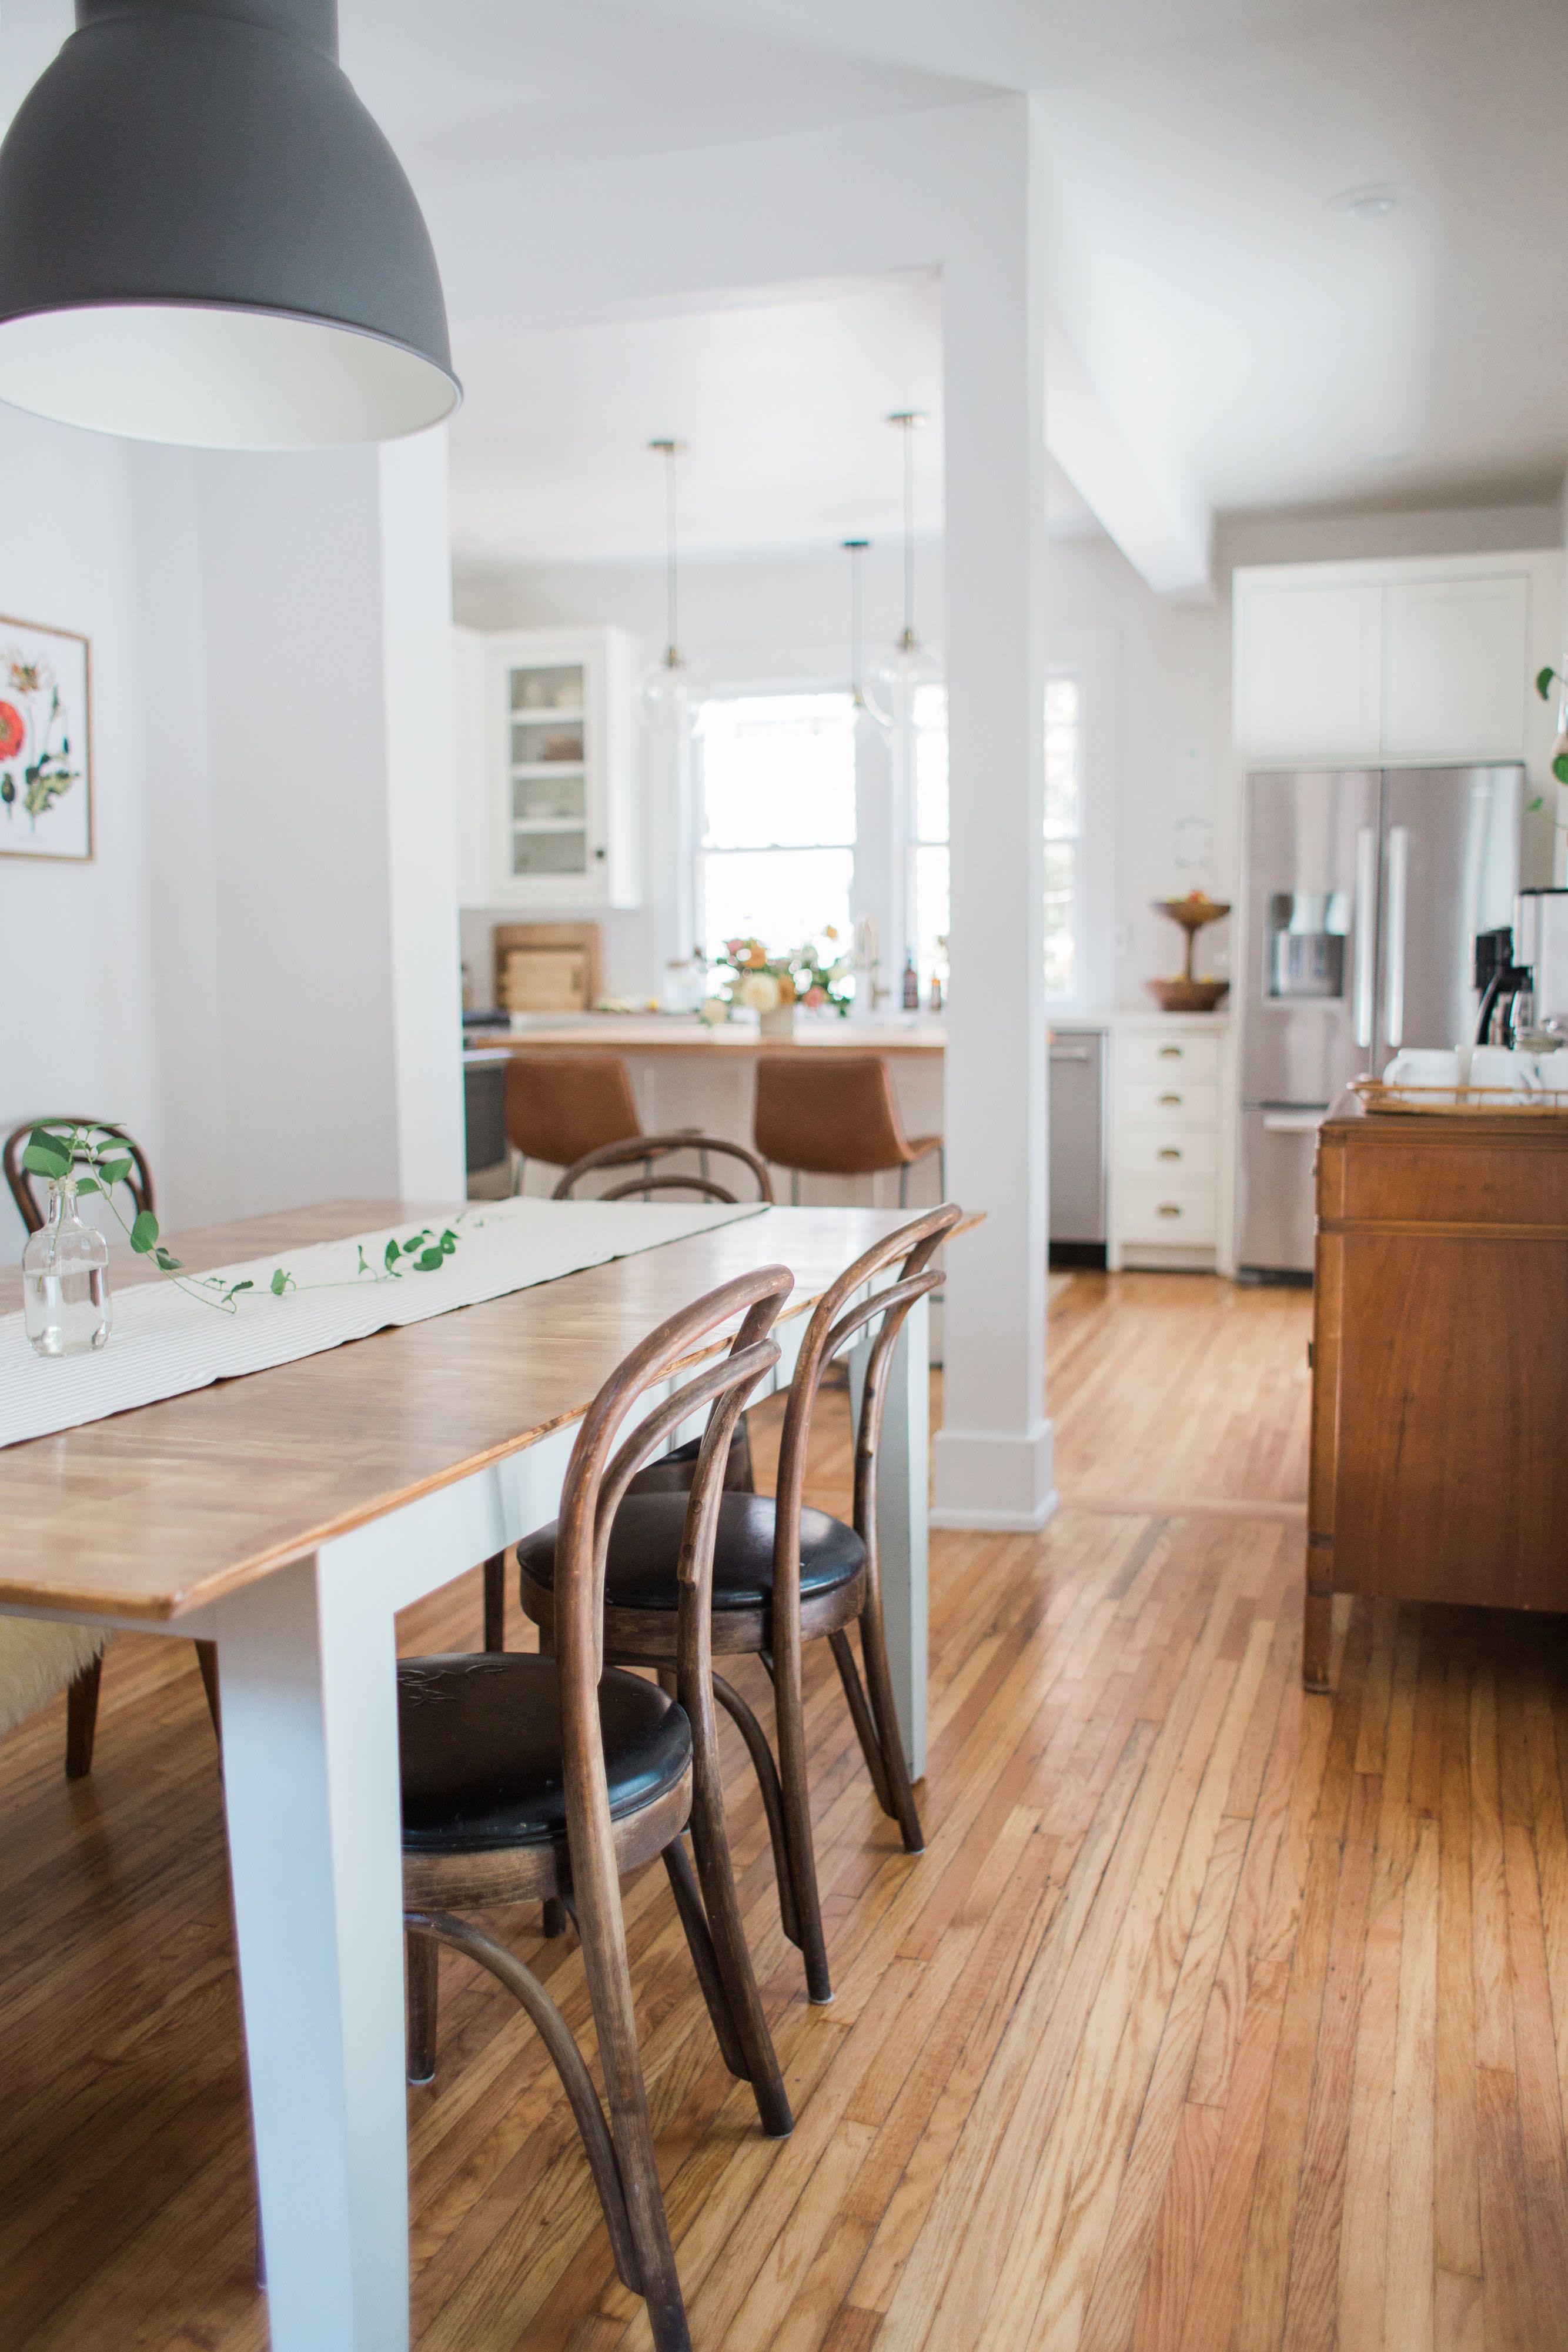 Before After A 1920s Kit House Gets A Modern Makeover Kit Homes Dining Room Design Home Remodeling